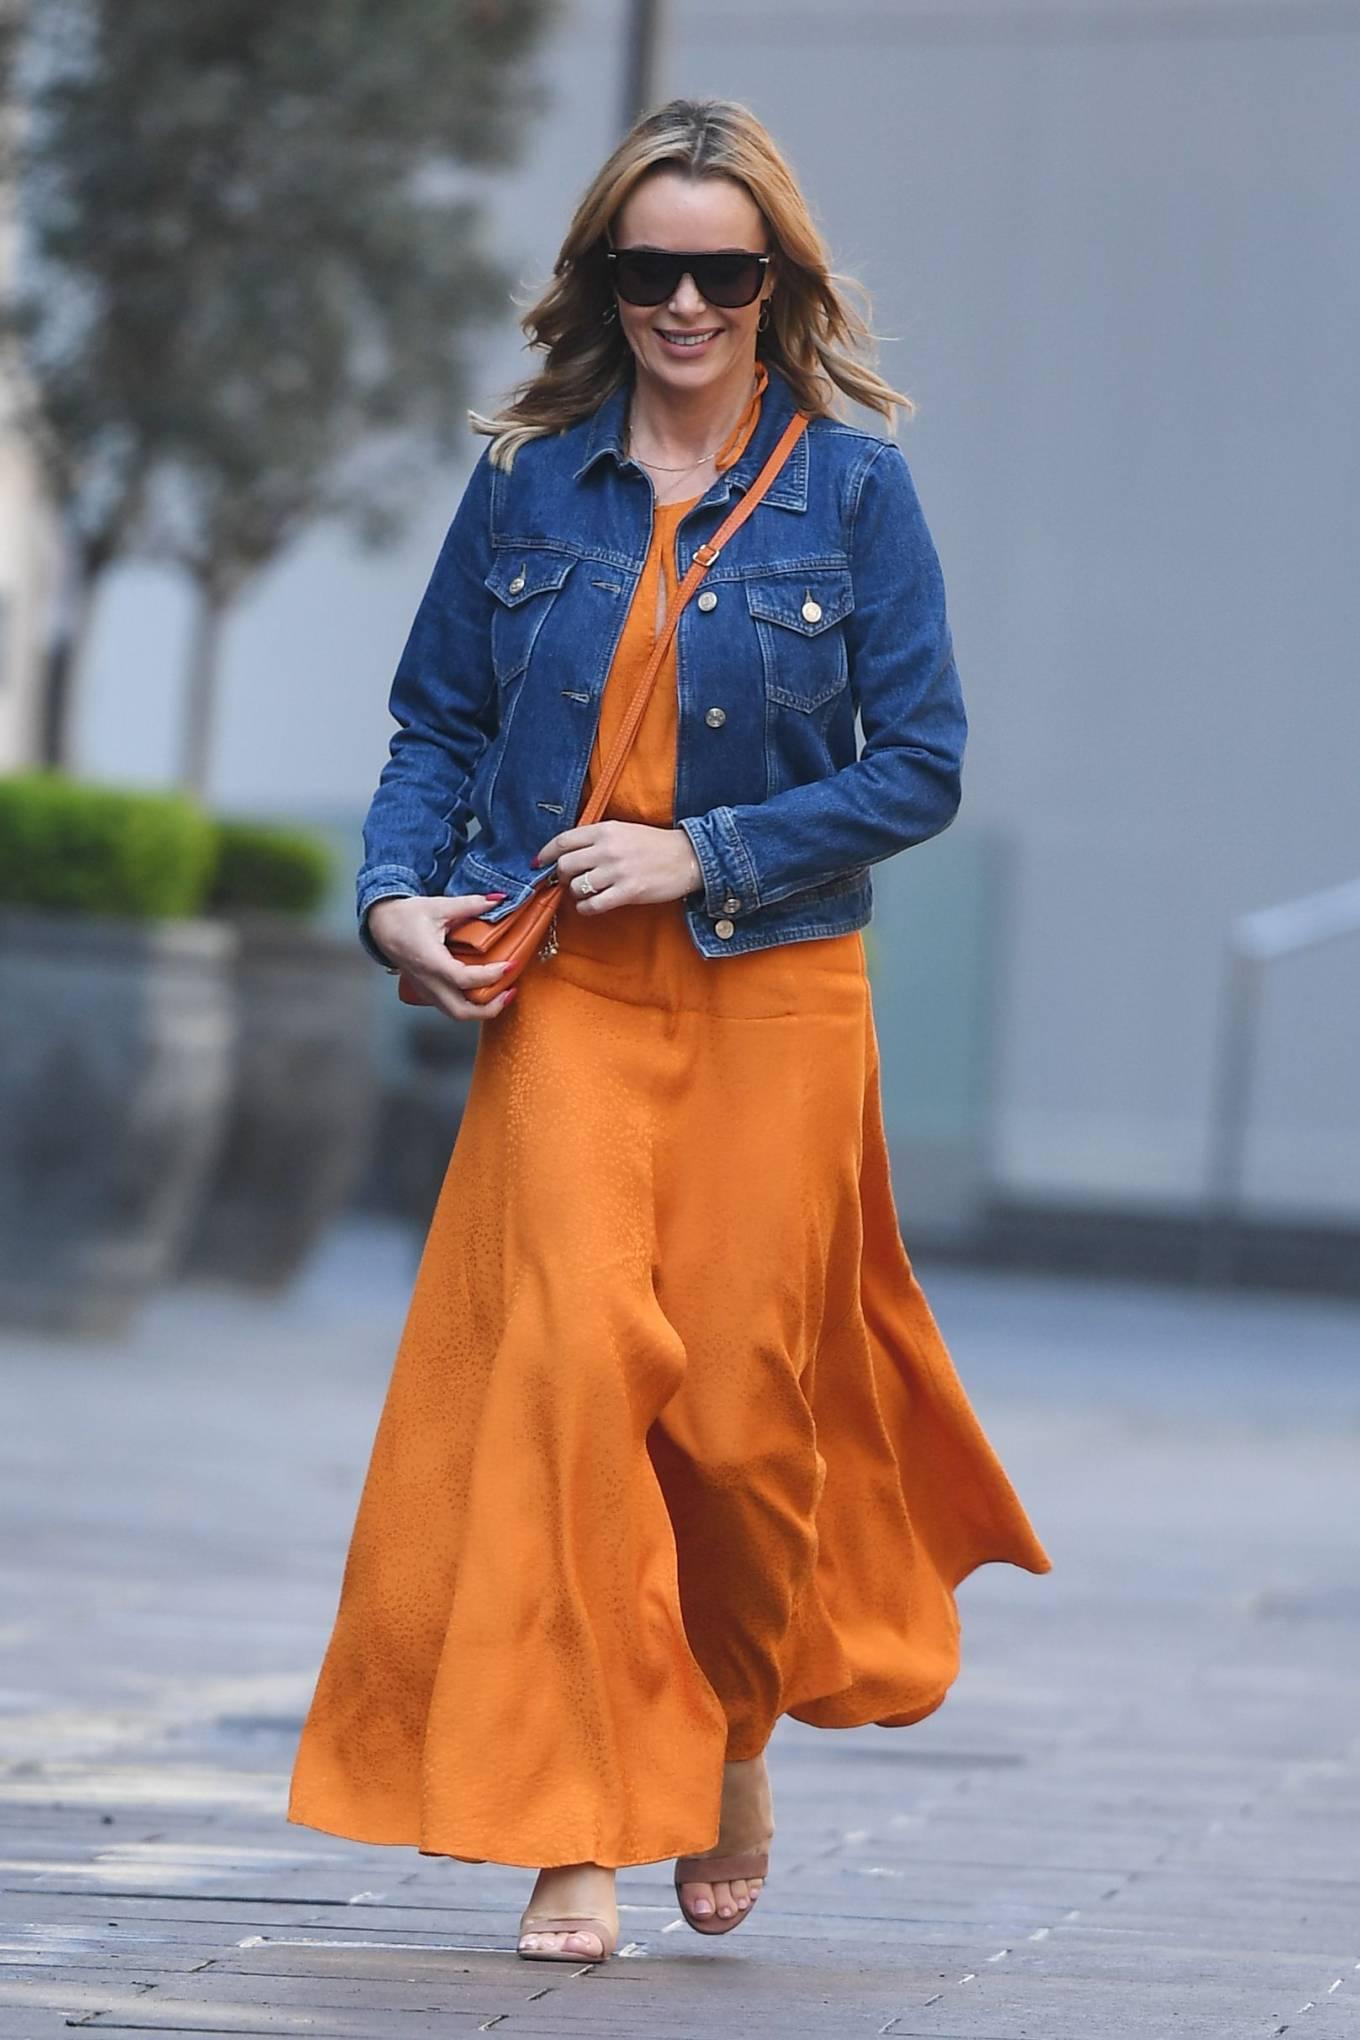 Amanda Holden 2021 : Amanda Holden – In dress leaving the Global Radio Studios in London-03